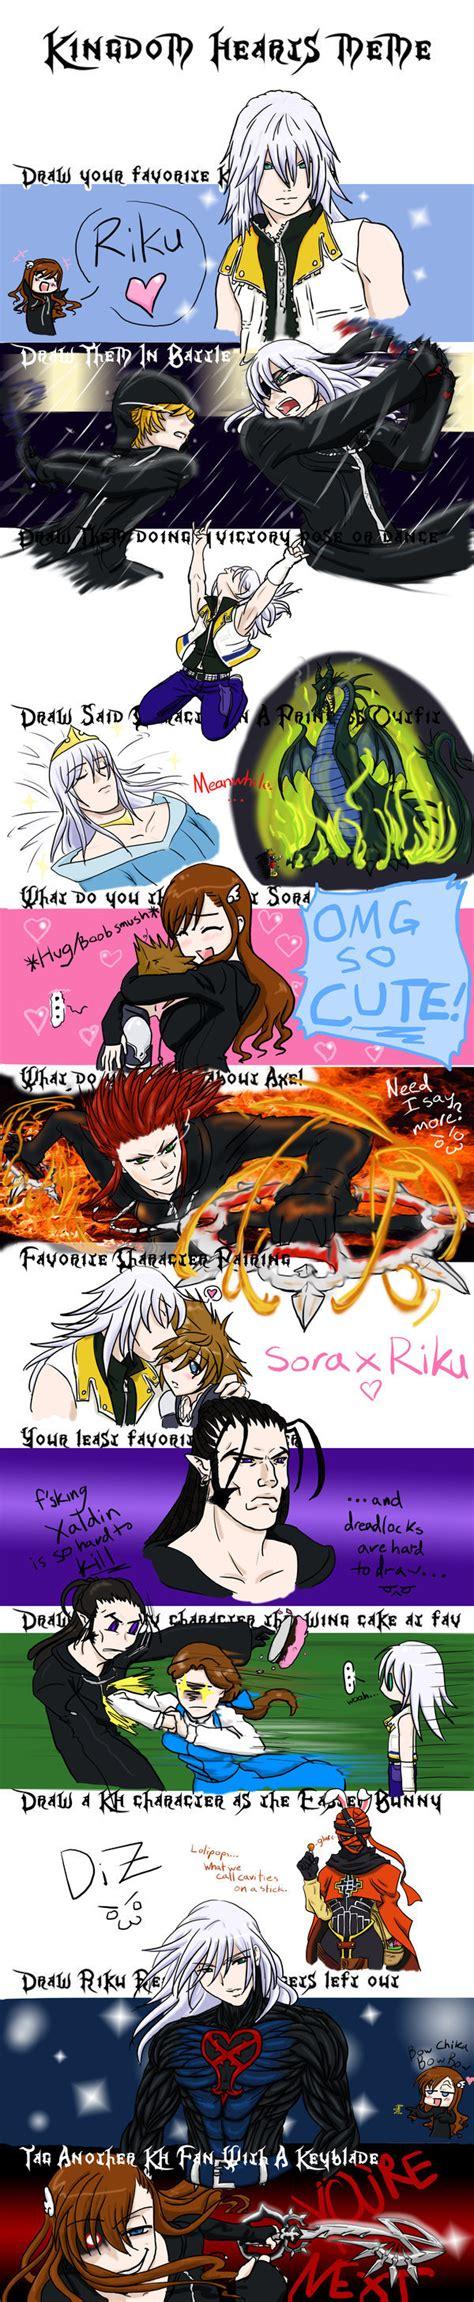 Kingdom Hearts Memes - kingdom hearts meme by tehp wingavenger on deviantart